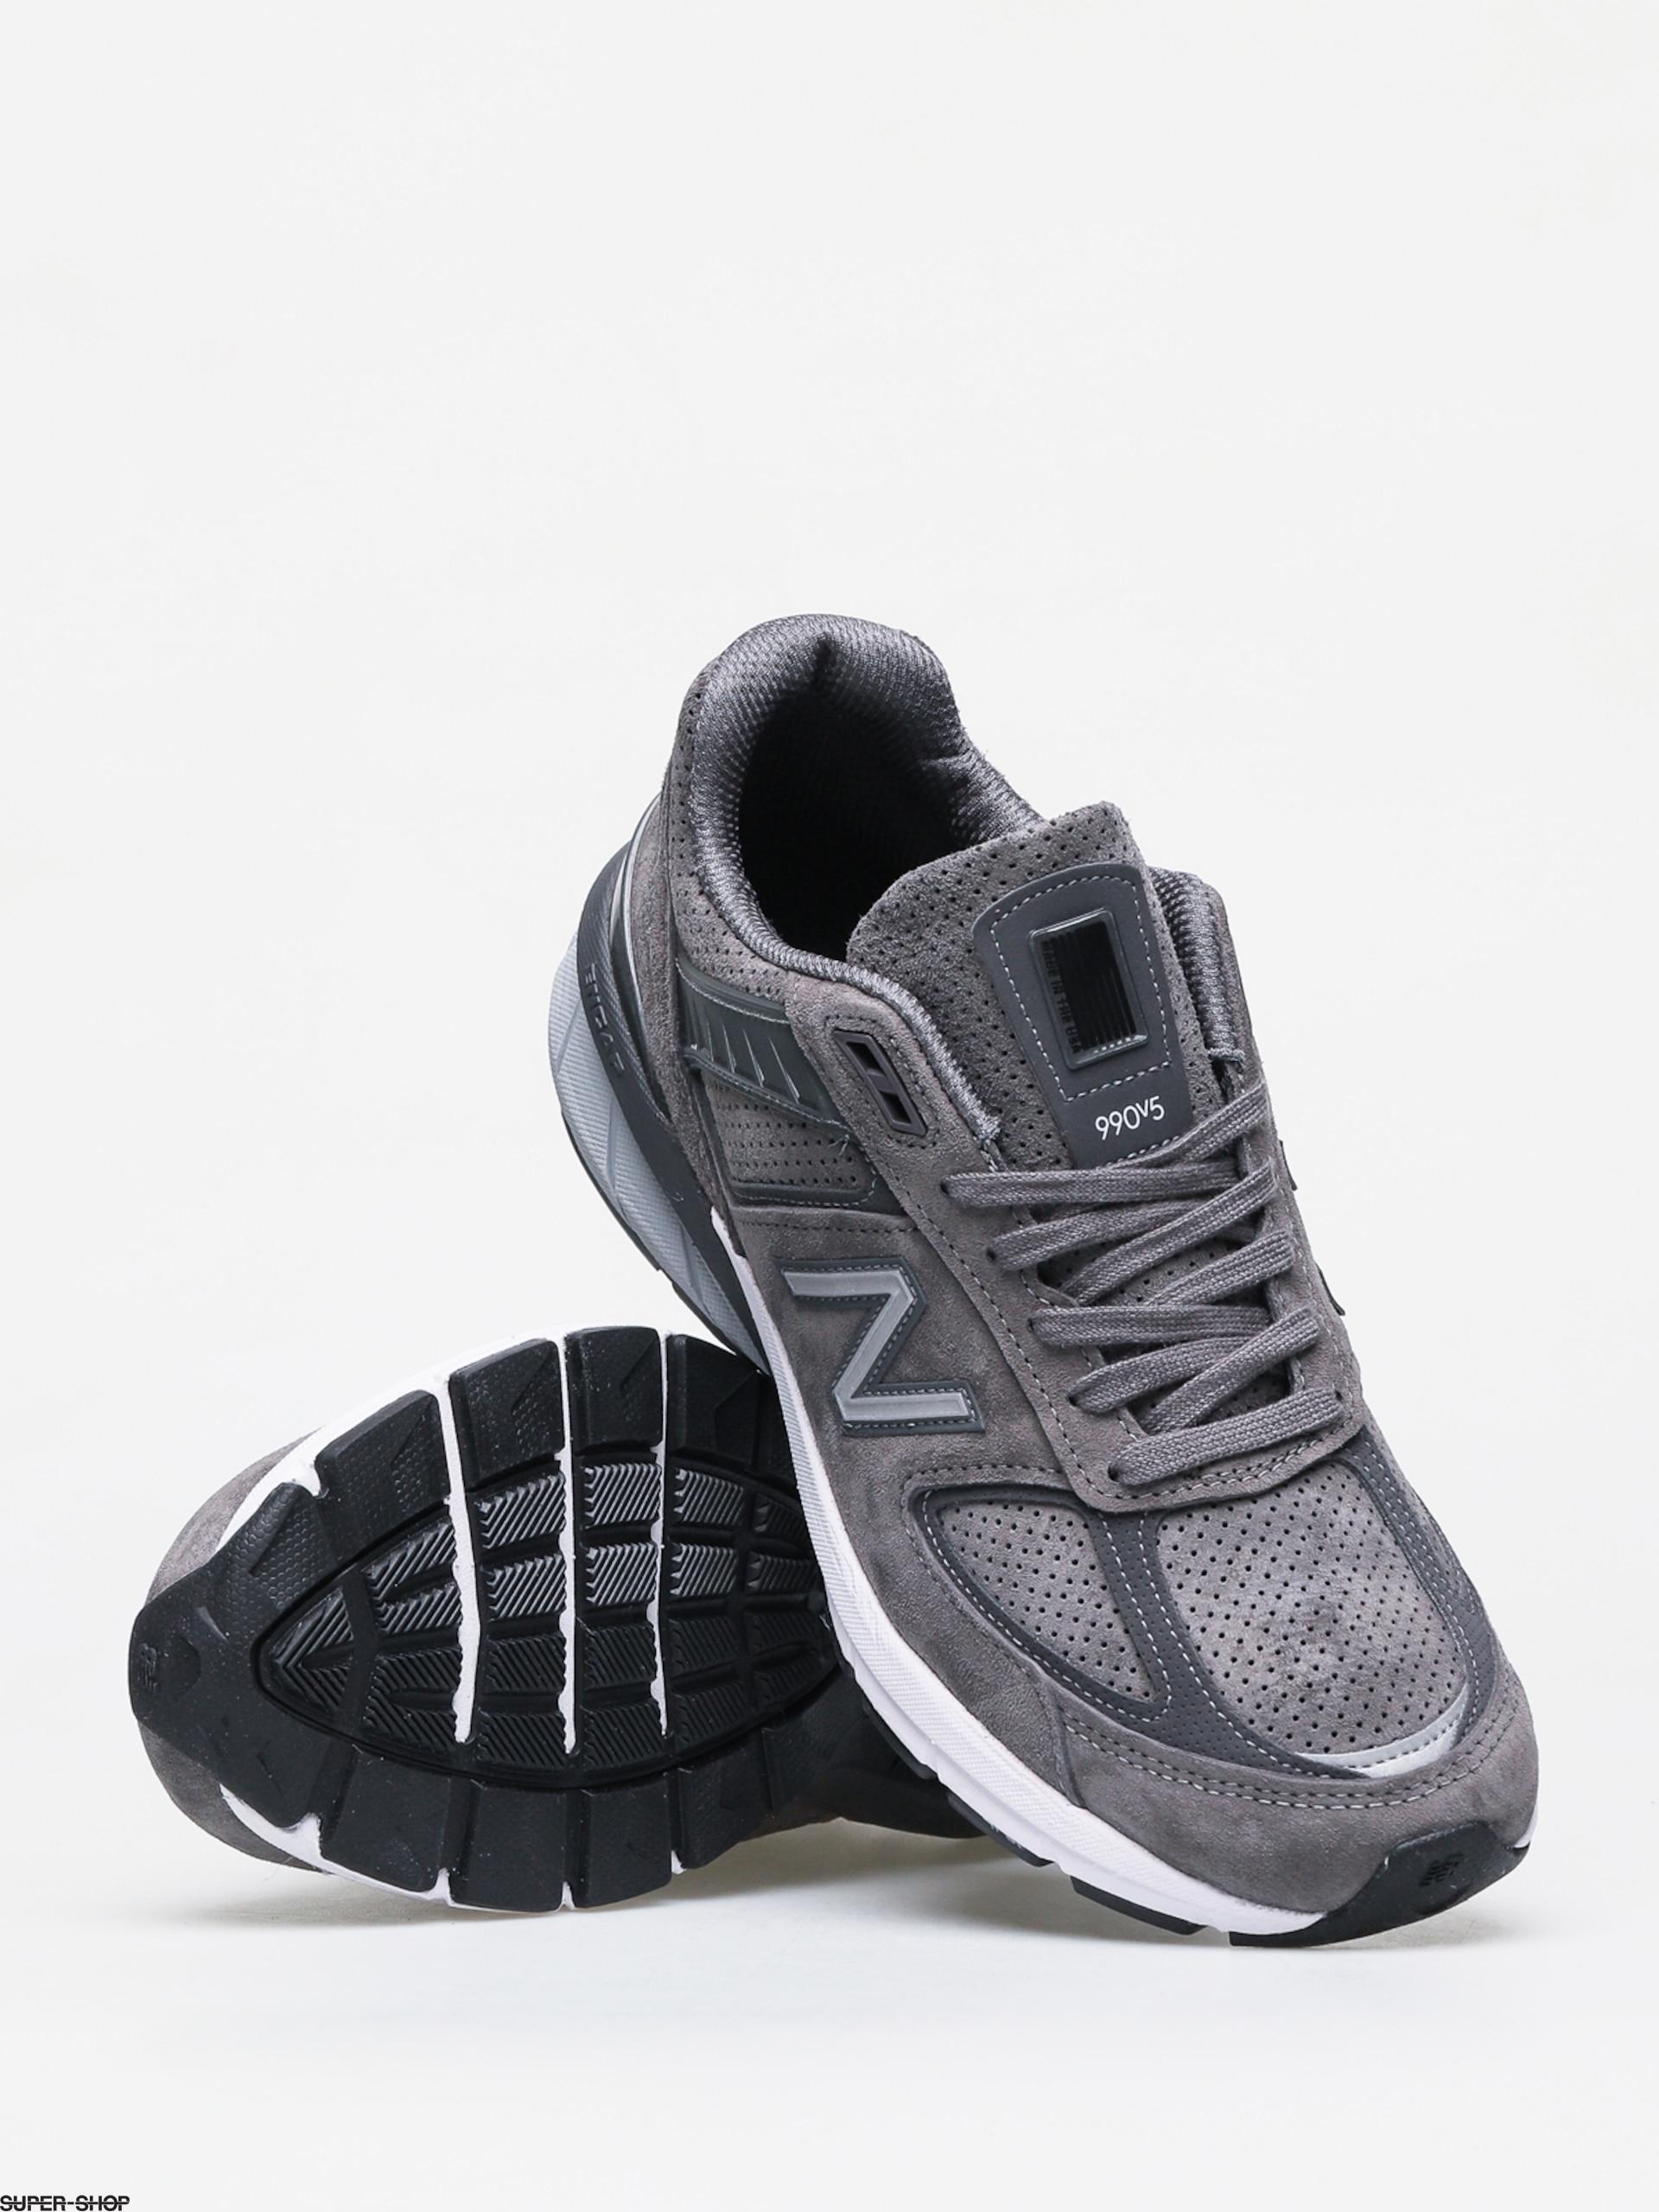 half off 44944 b16a1 New Balance 990 Shoes (grey/white)